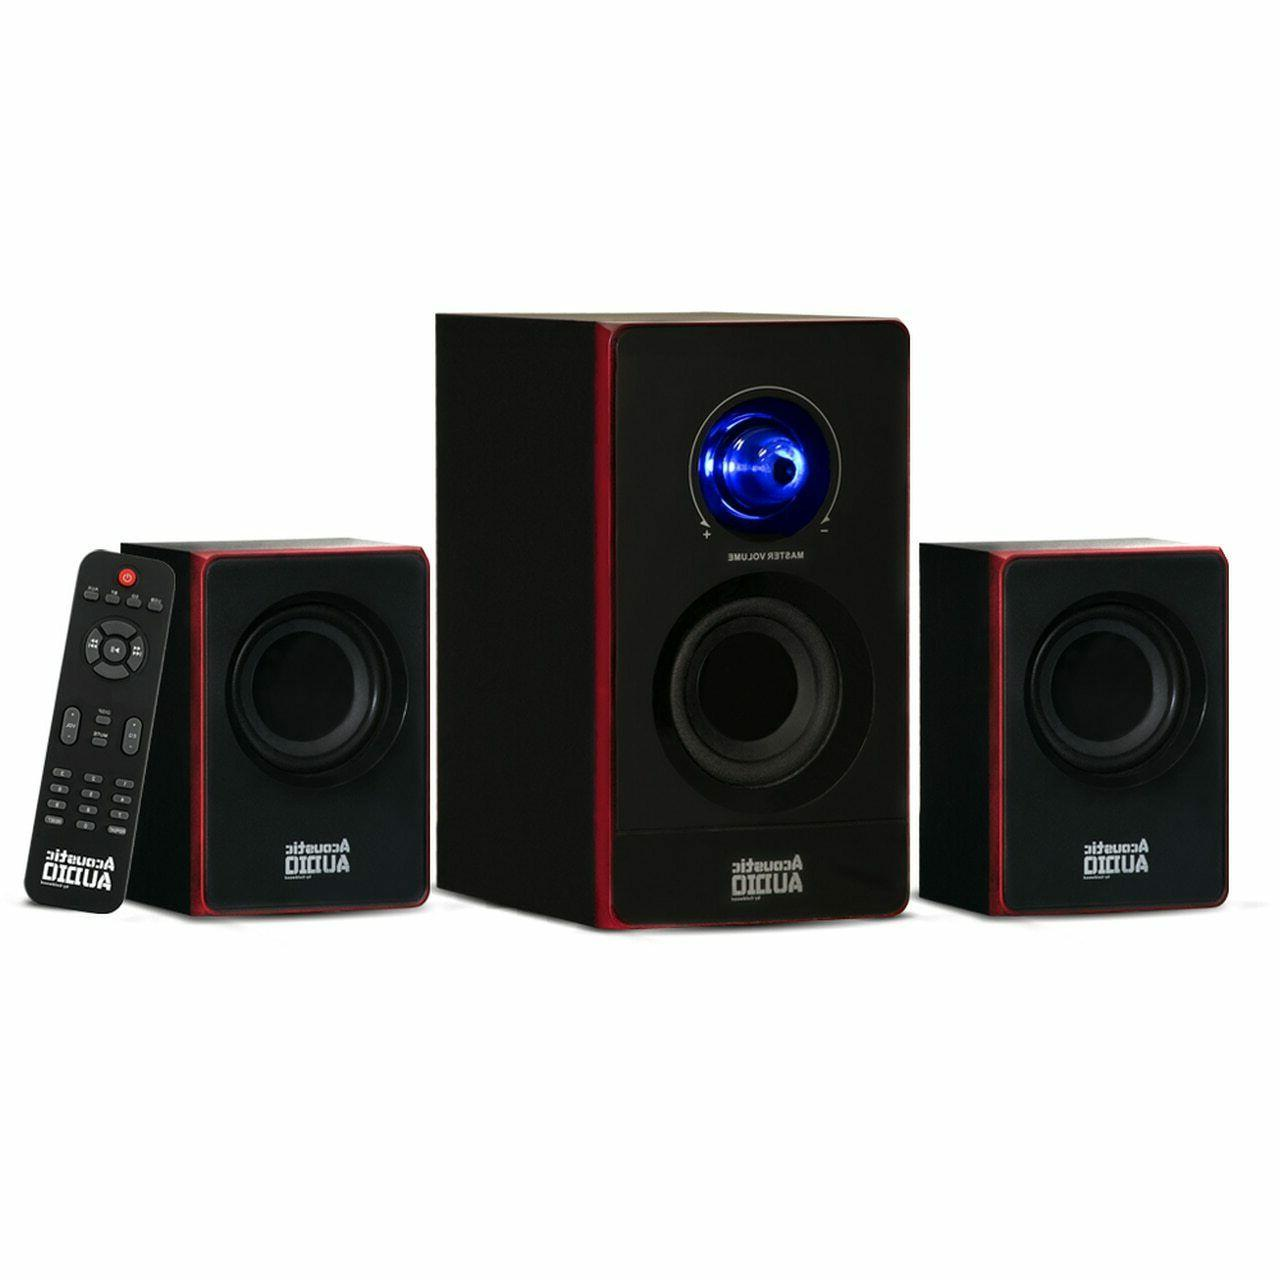 aa2103 bluetooth 2 1 speaker system